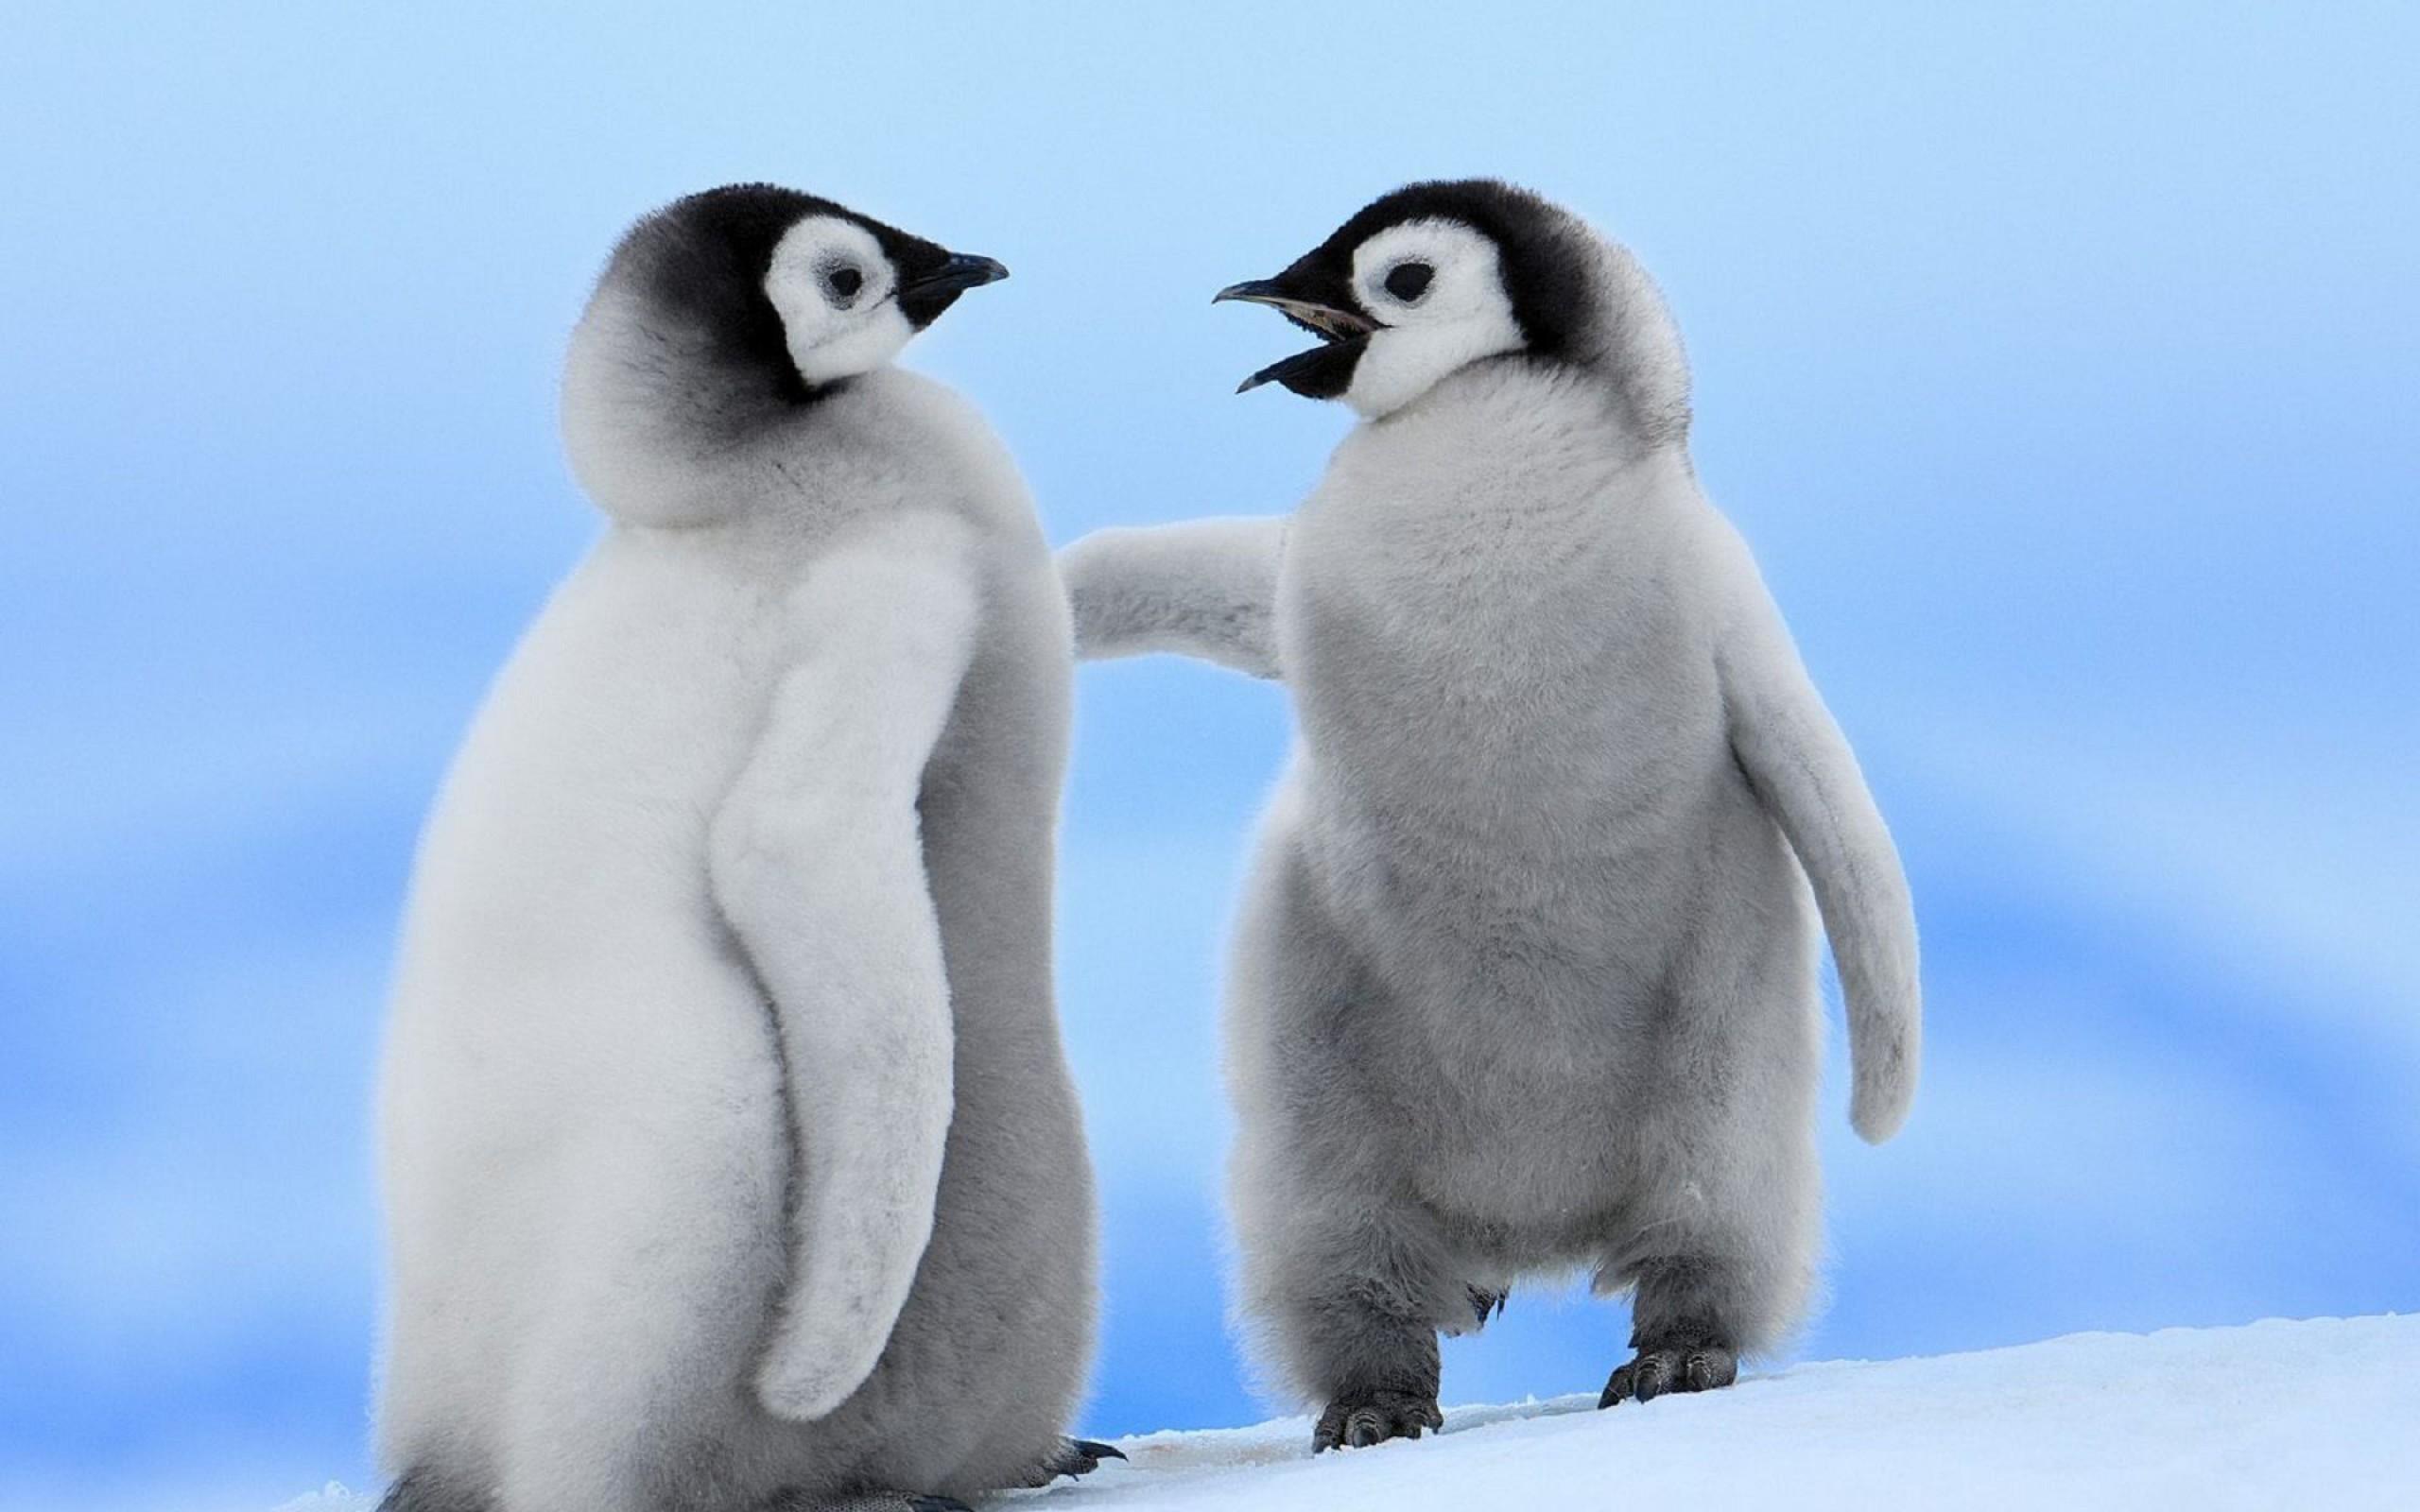 Baby Penguin Wallpaper 55 images 2560x1600